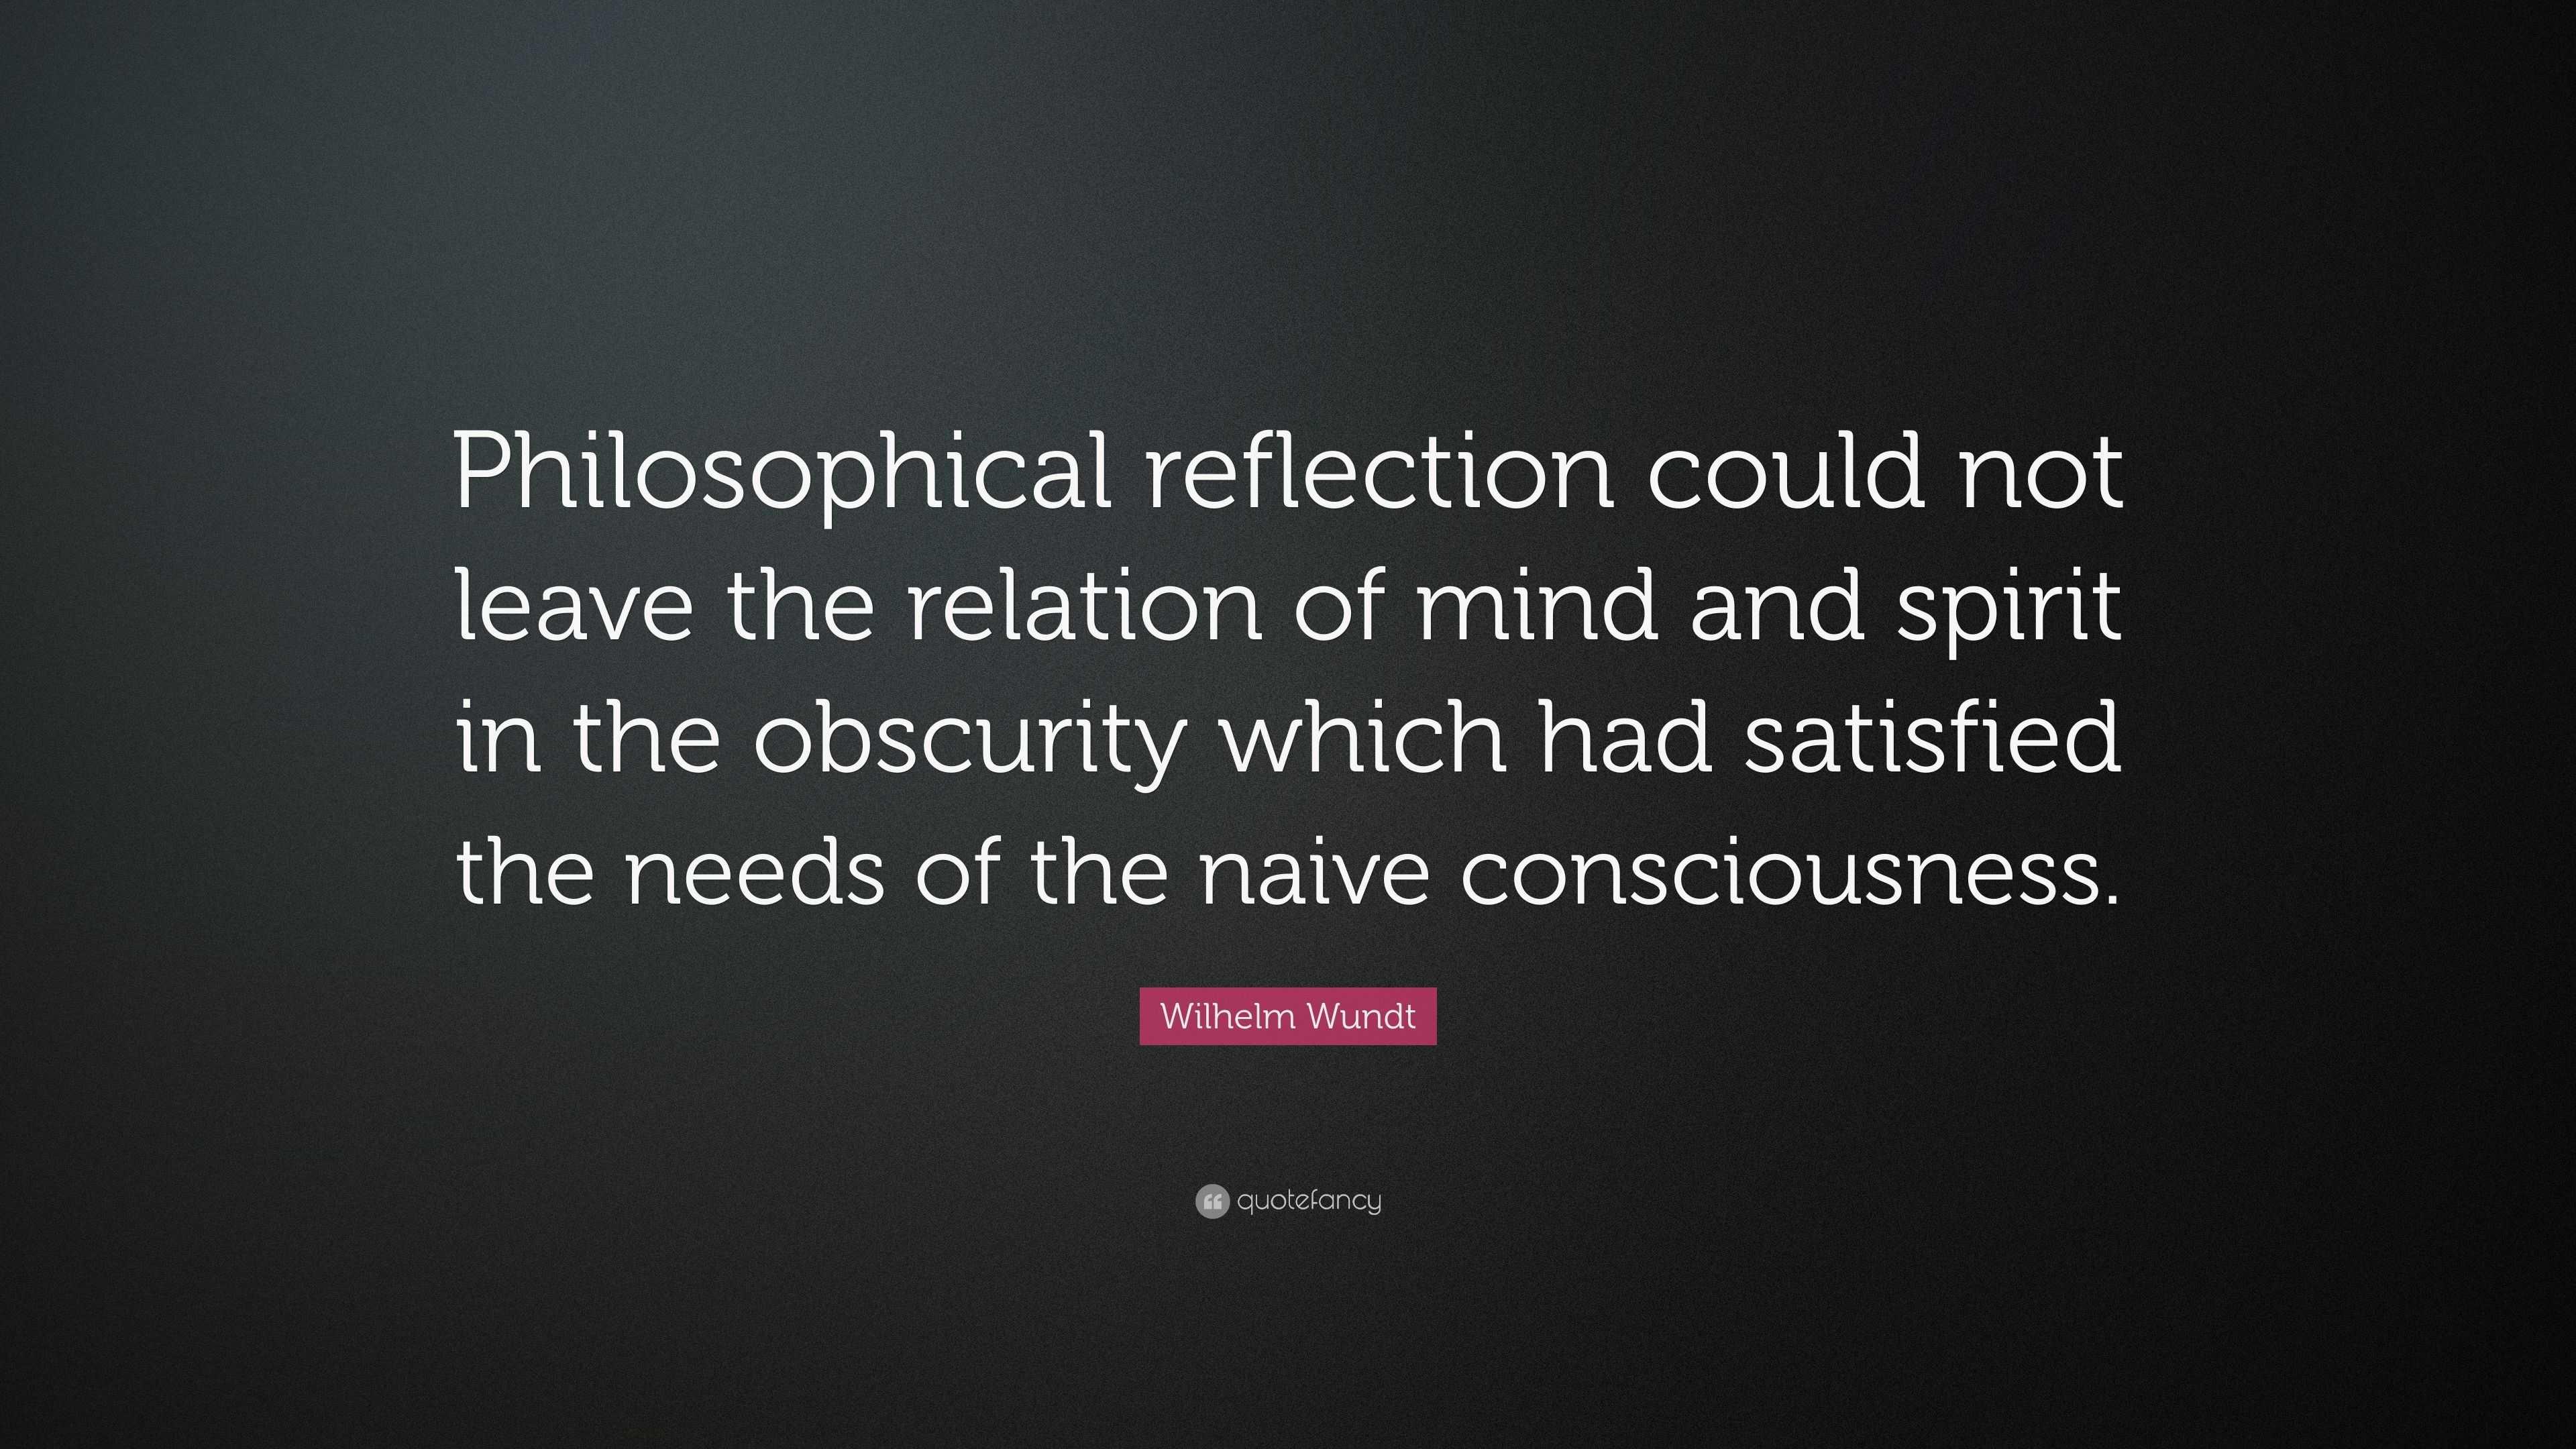 wilhelm wundt philosophy